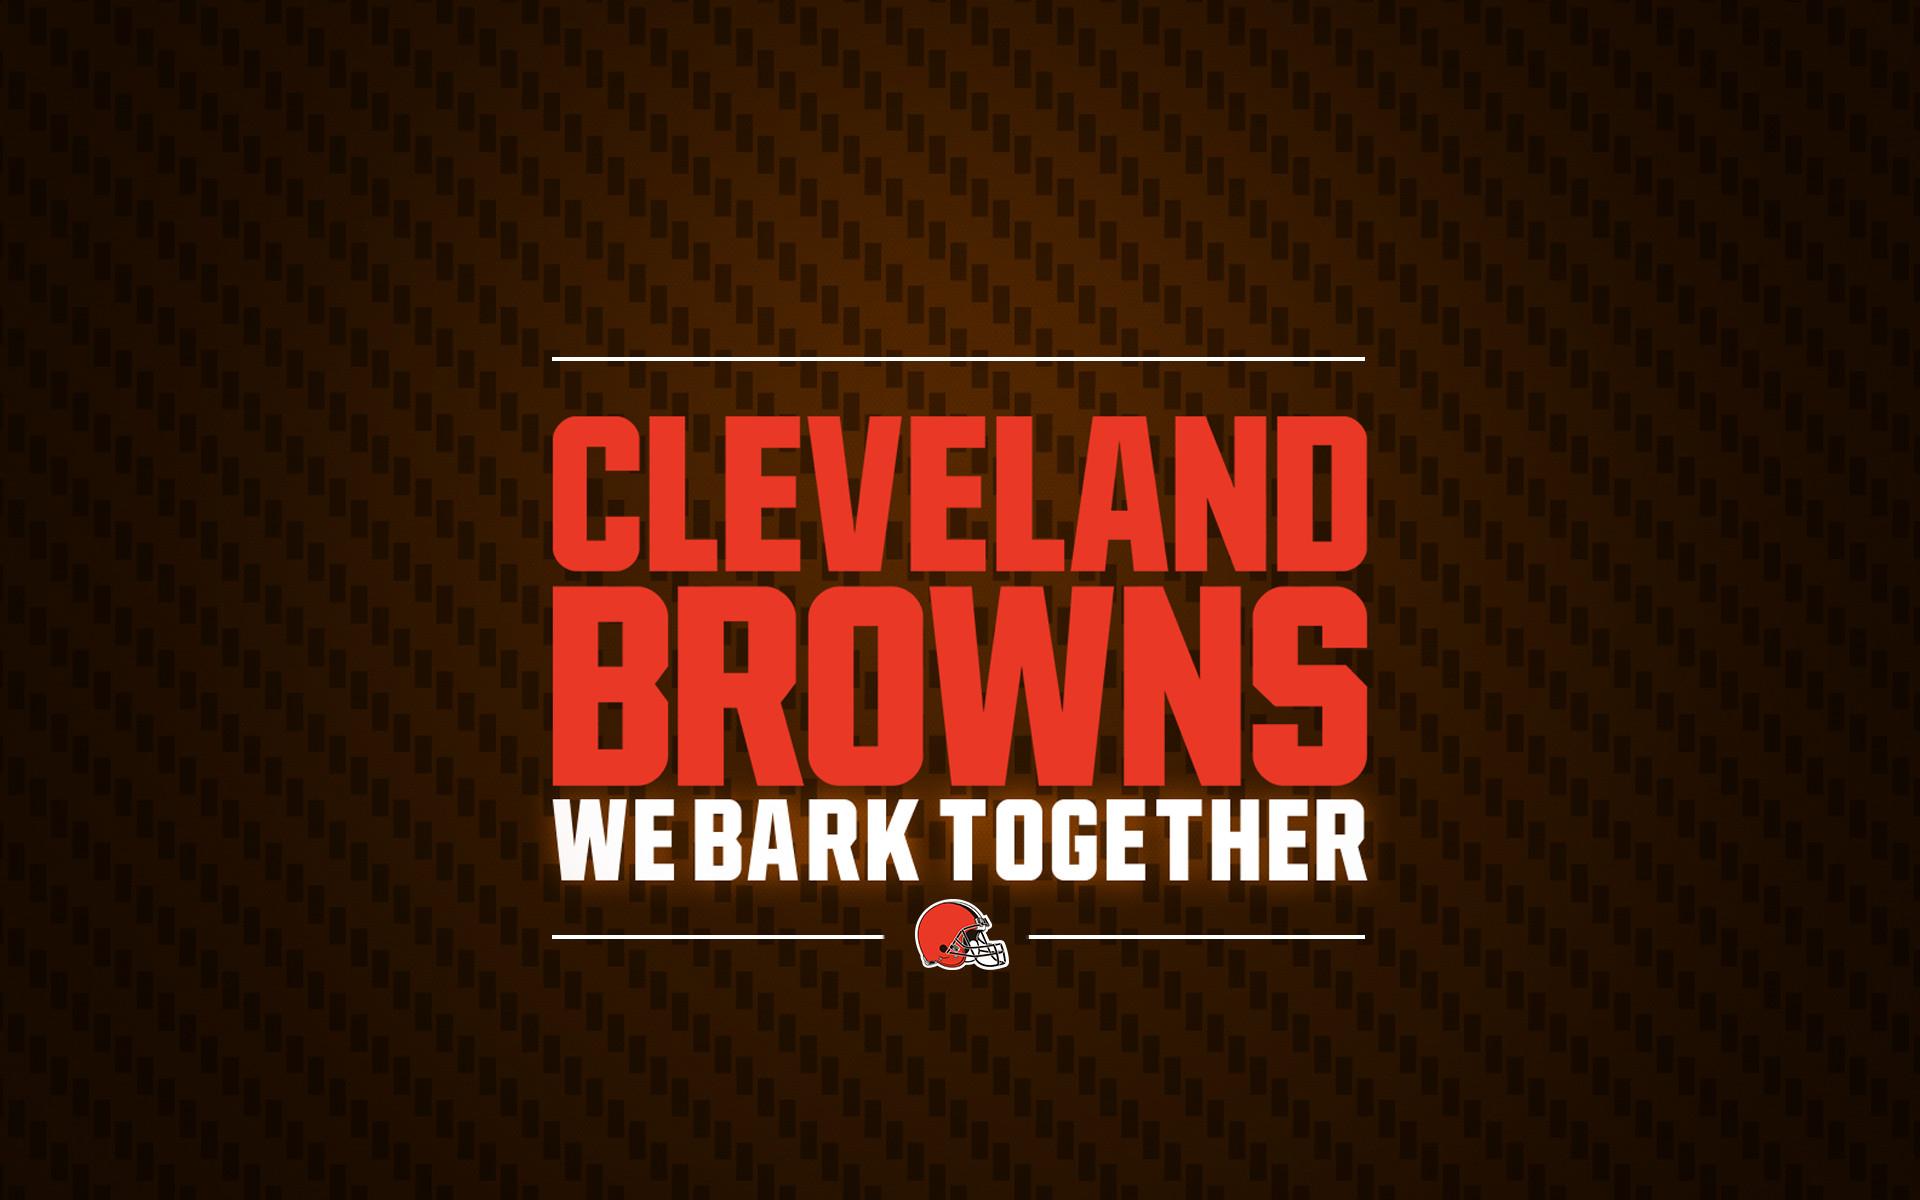 VPK.42 Cleveland Browns Screensavers, Eufemia Vandehey